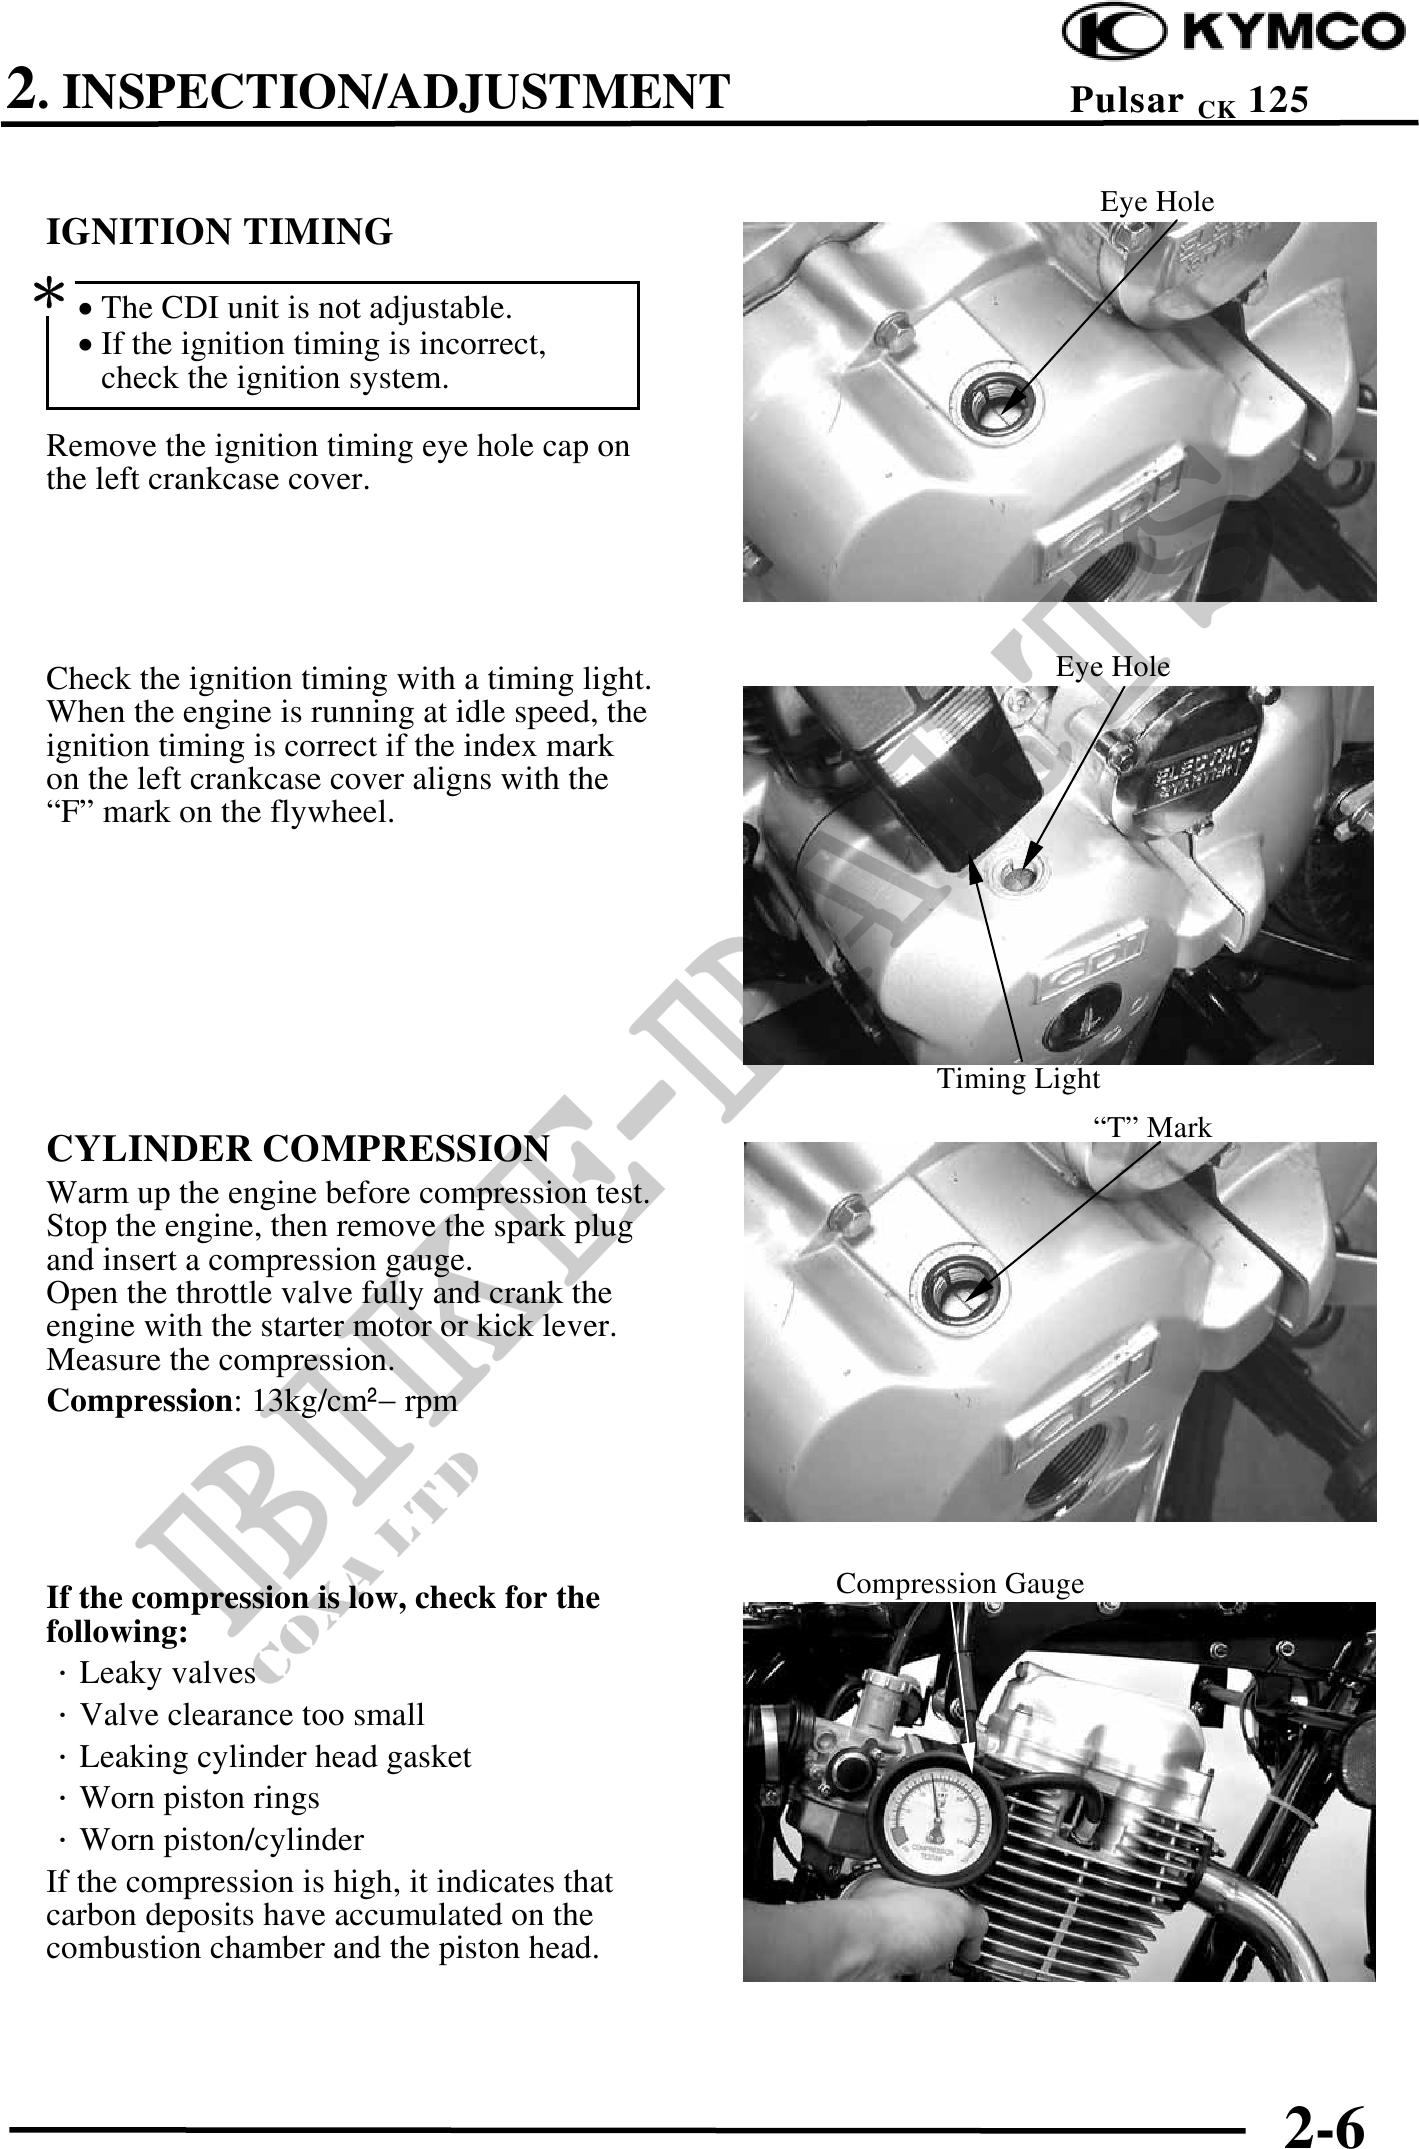 KYMCO - Online Genuine Spare Parts Catalog